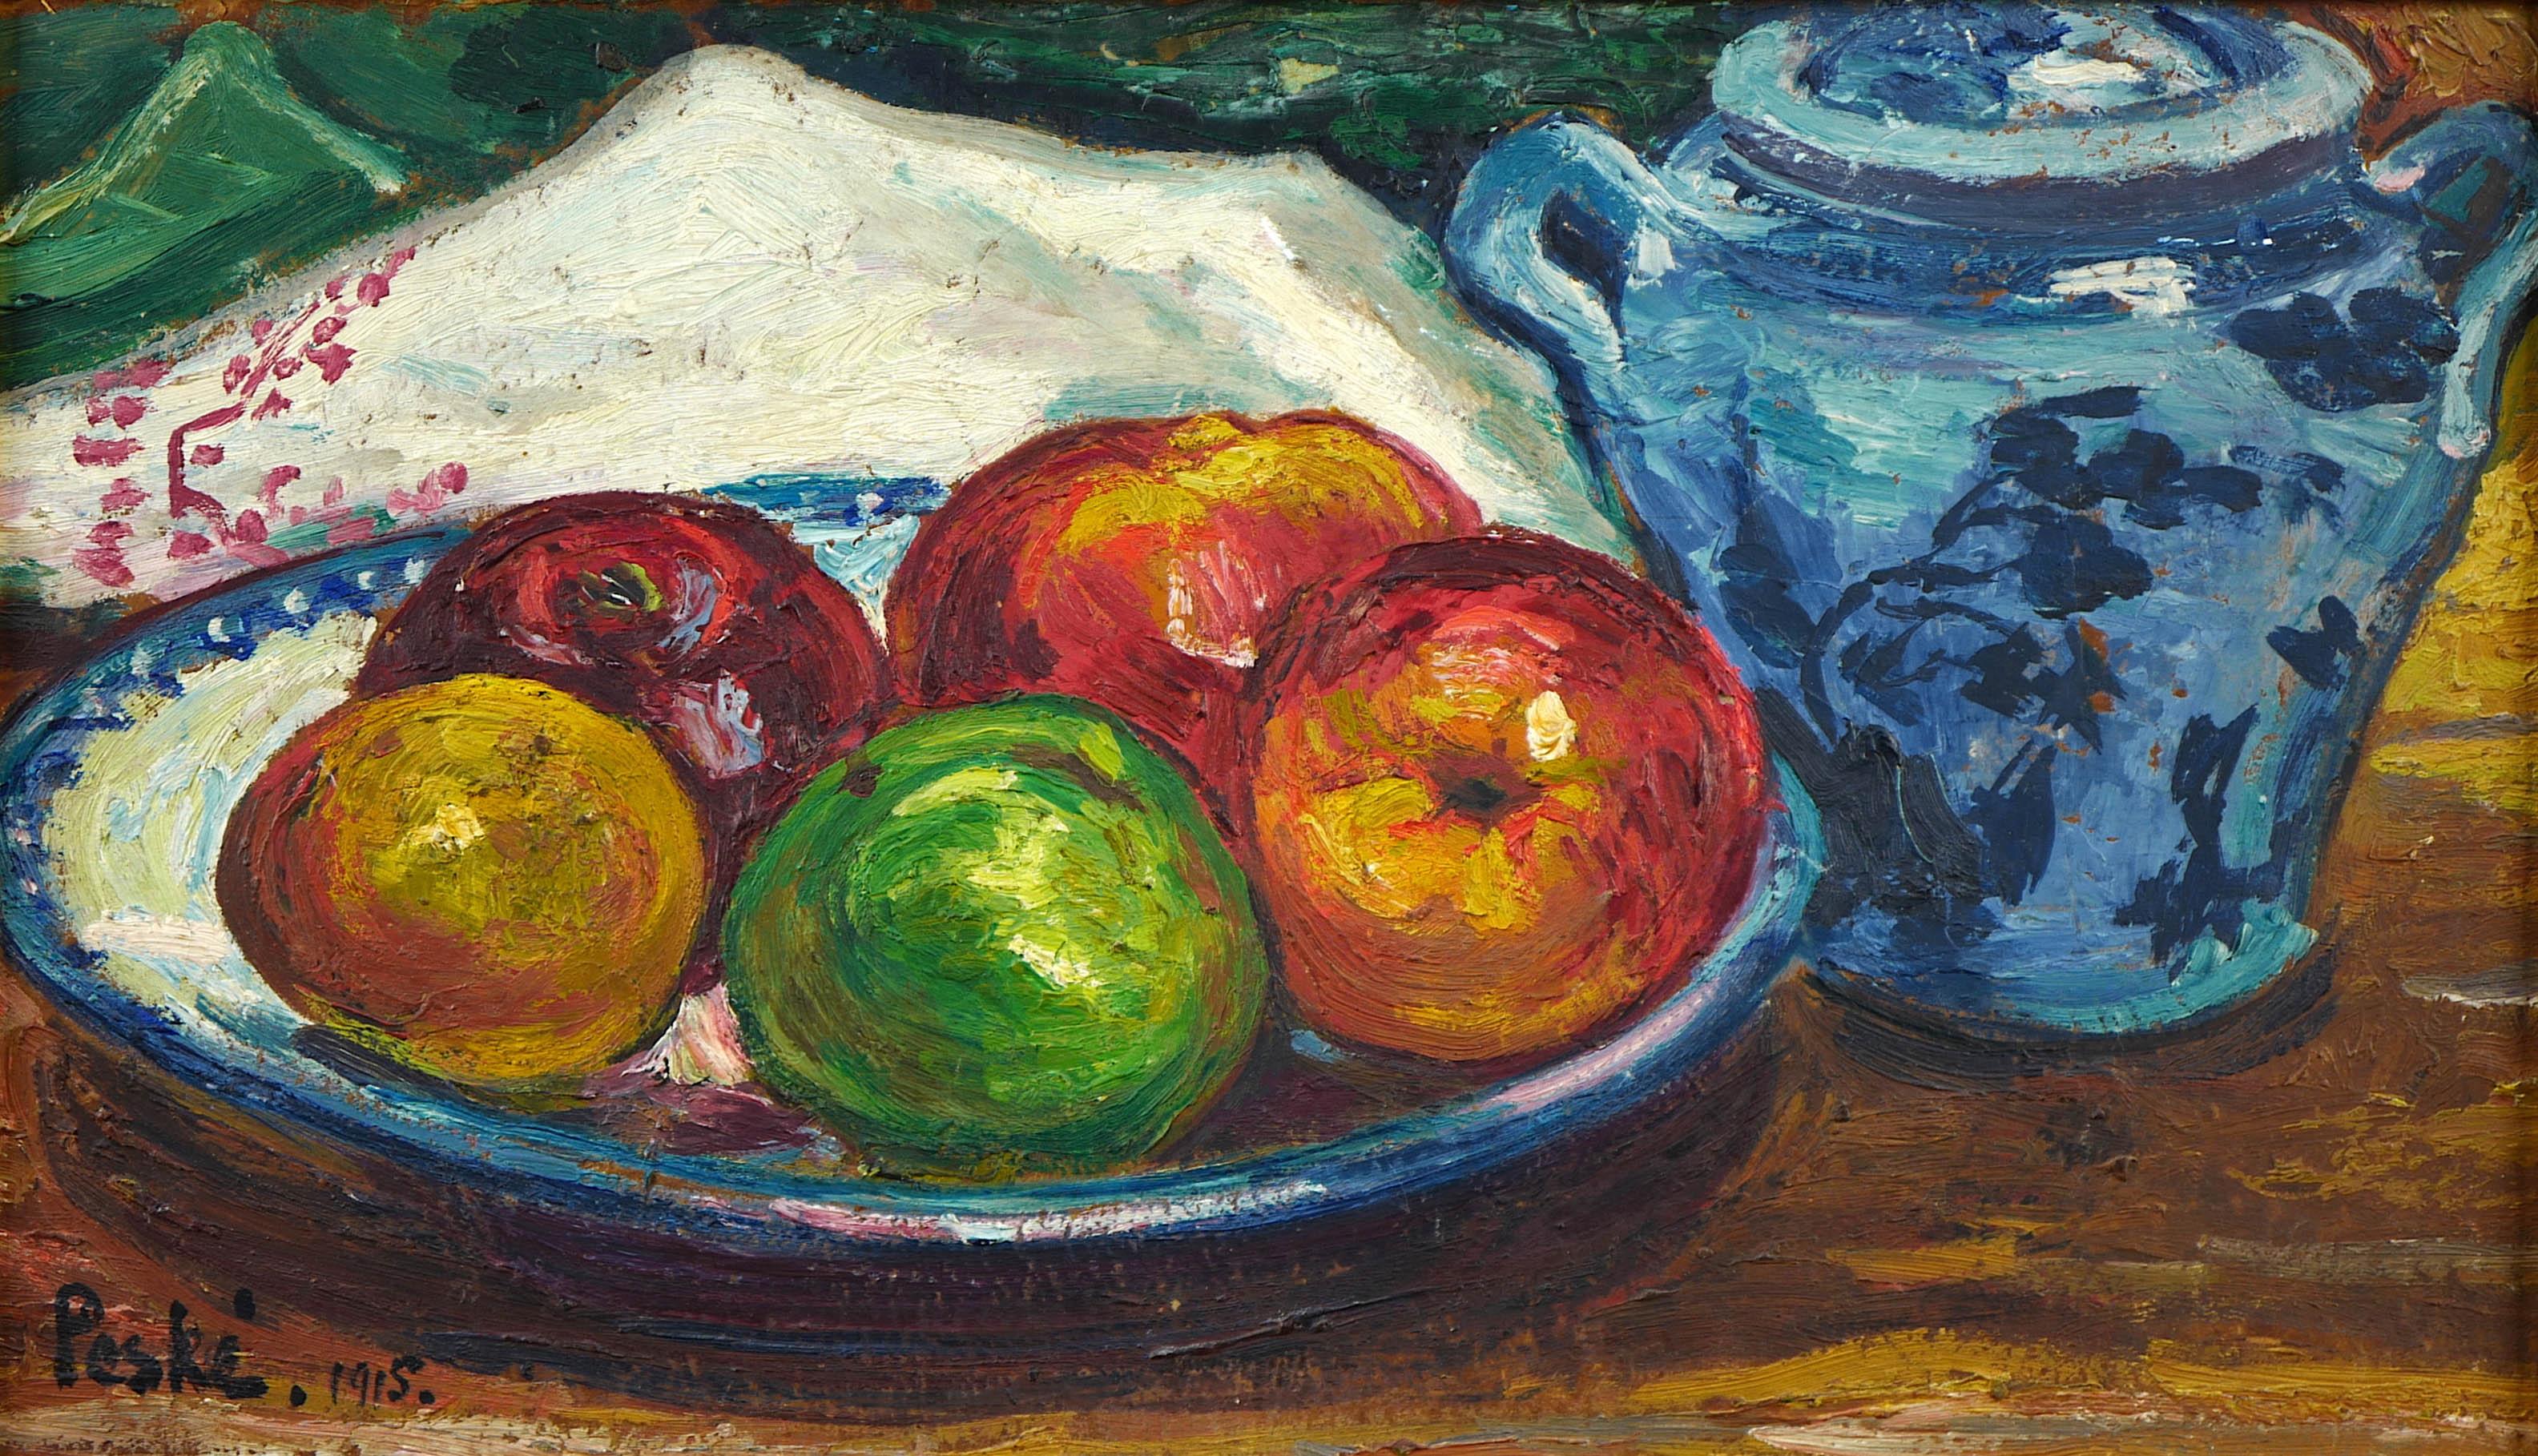 Martwa natura z dzbanem i jabłkami, 1915 r.